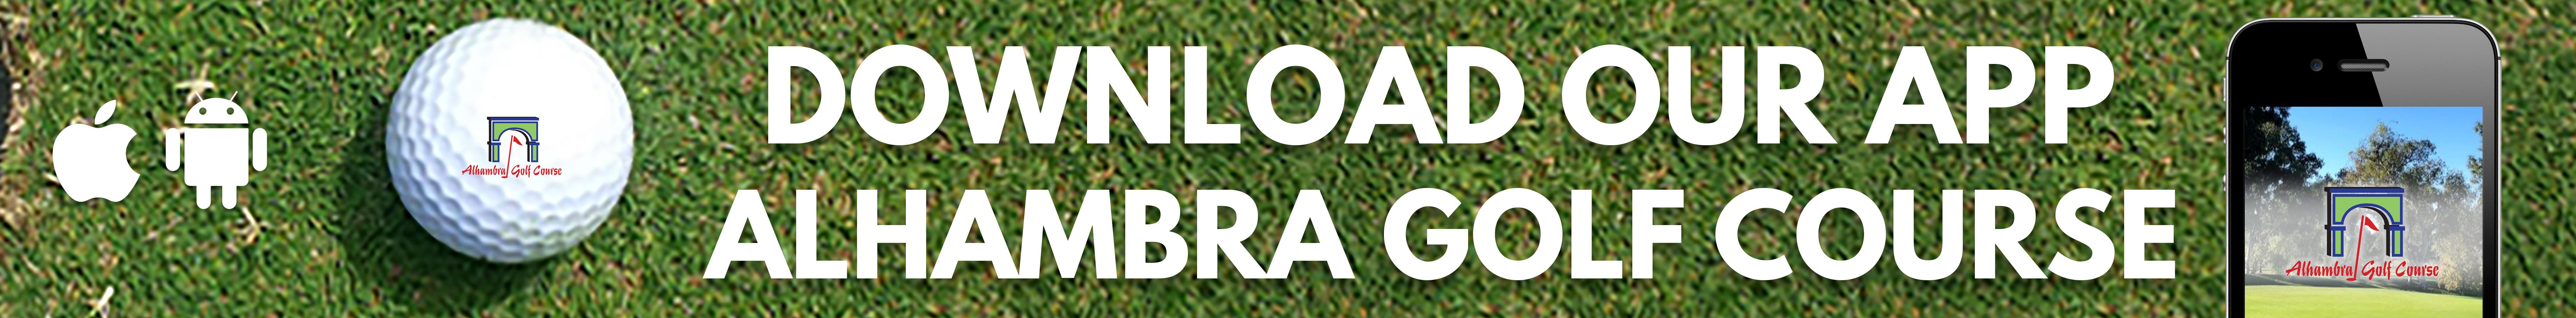 Alhambra Golf App